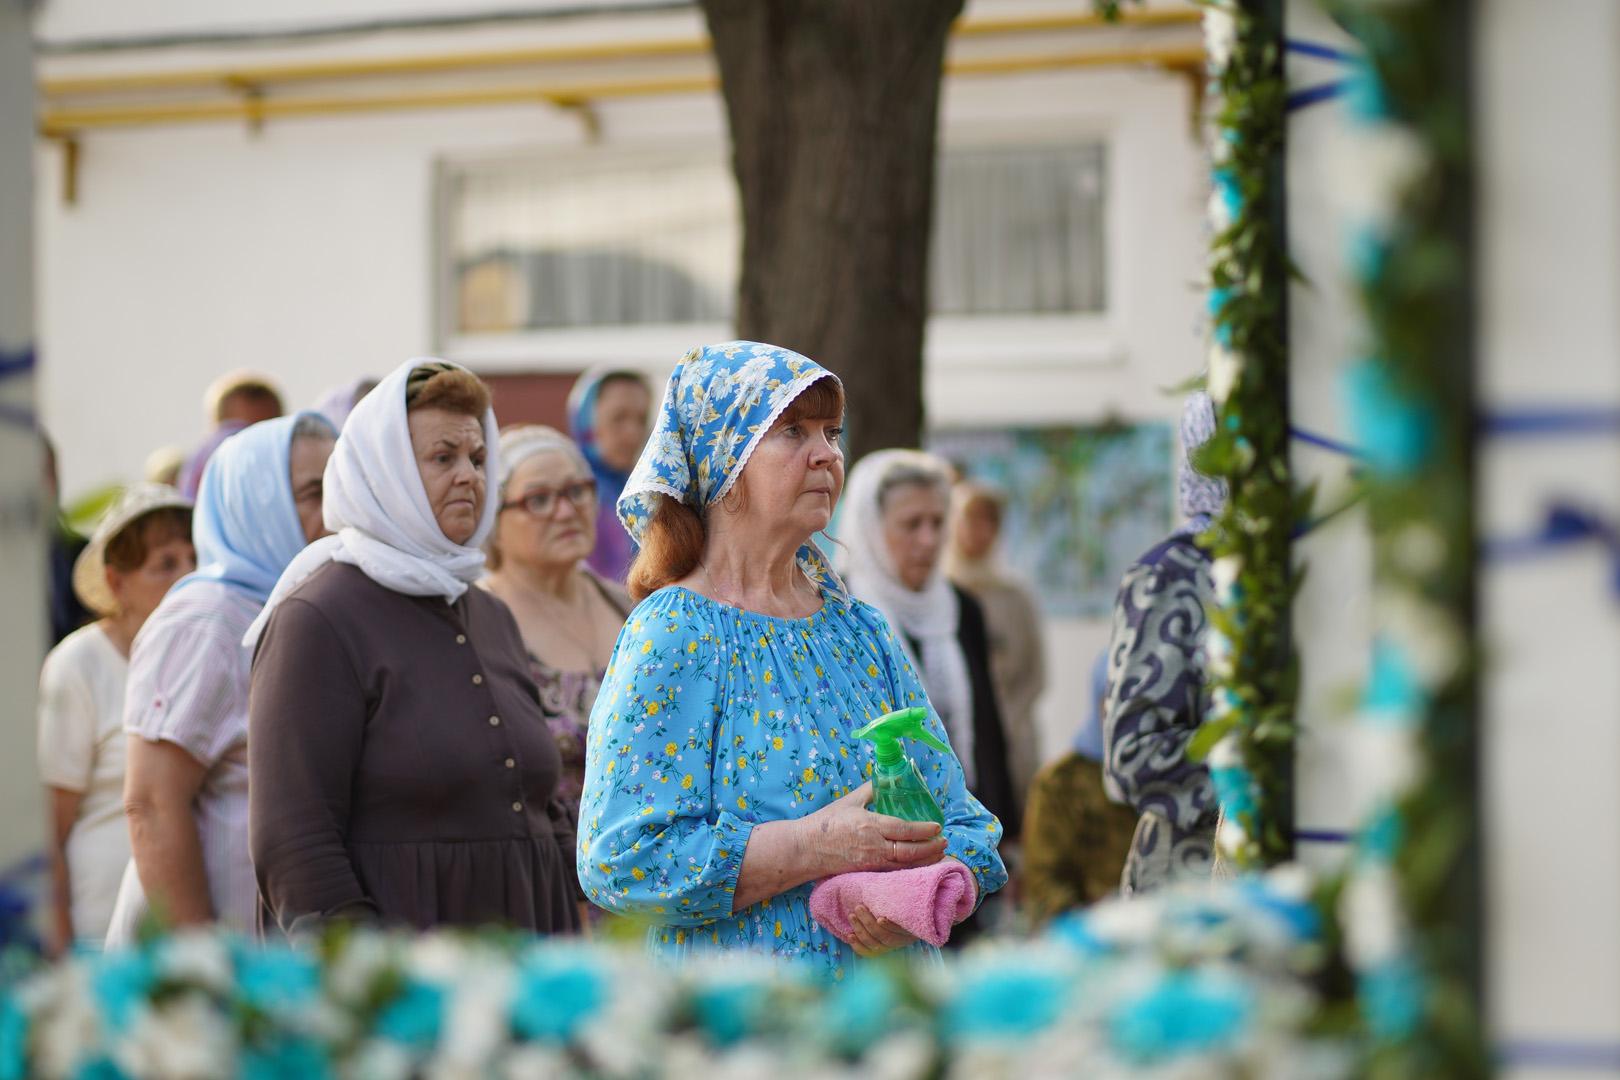 http://monuspen.ru/photoreports/eb9de00e1f5615849ea00b127bfcb98h.jpg